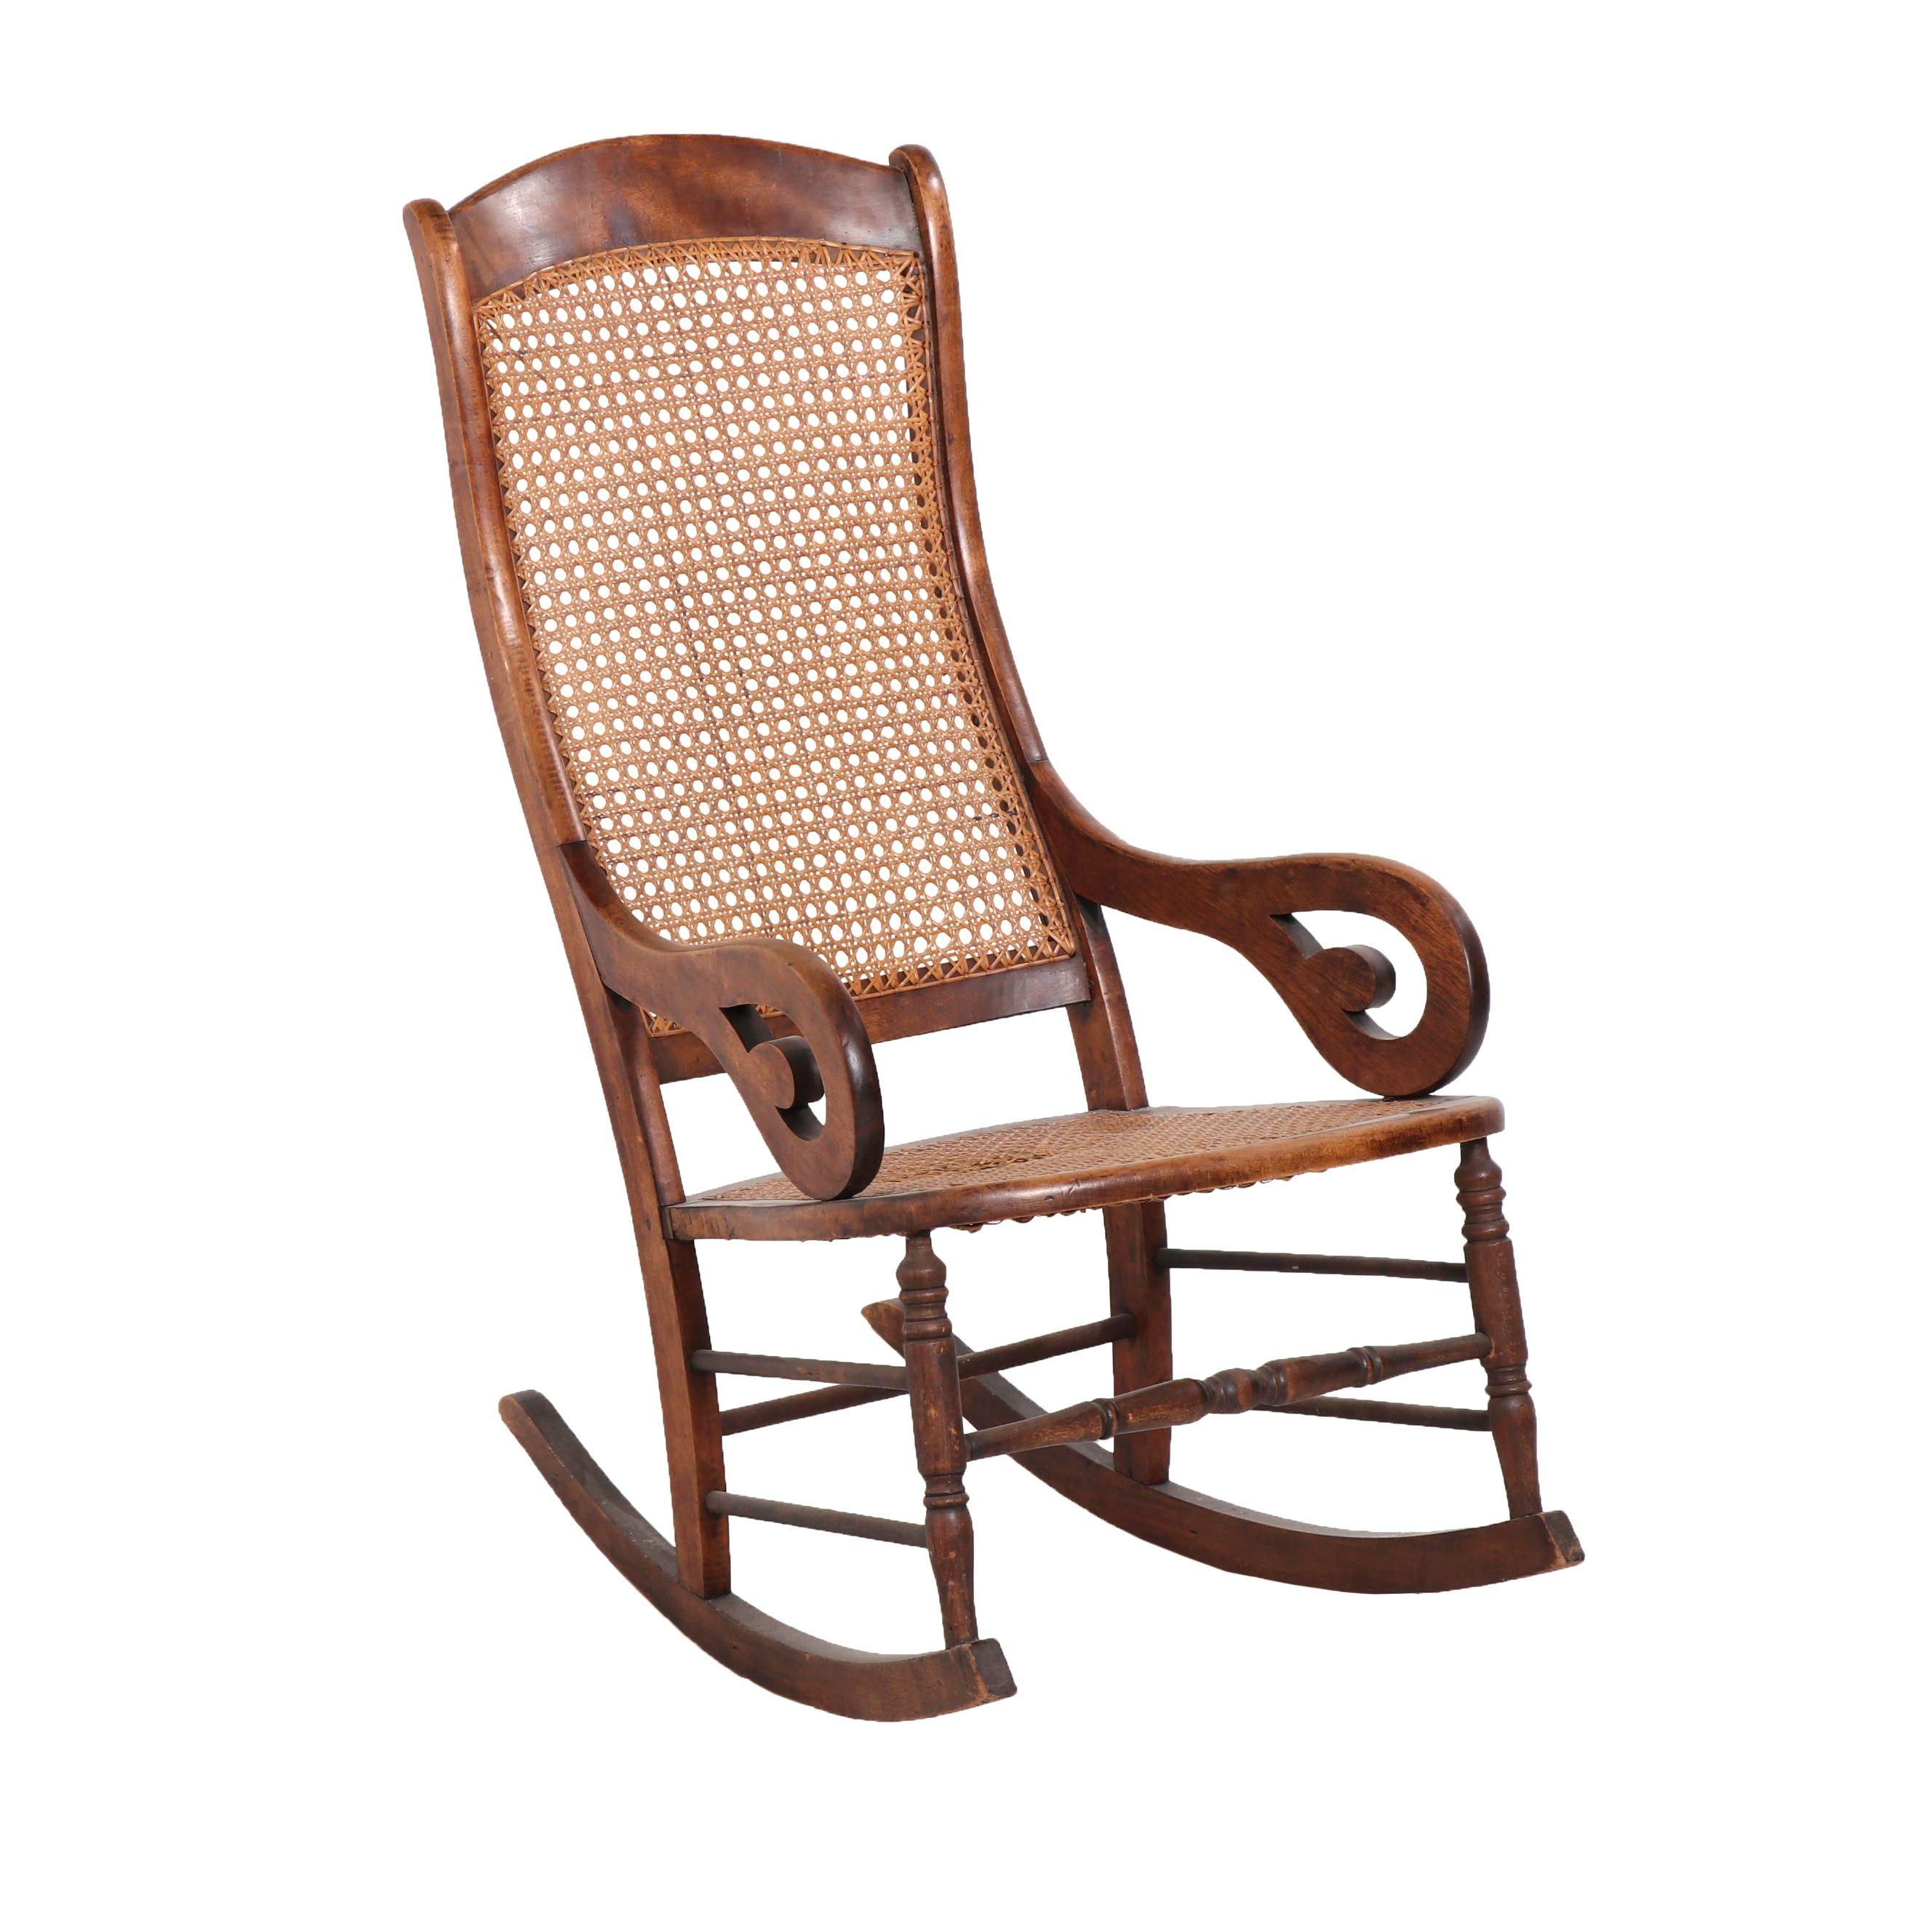 Vintage Wood Cane Back Rocking Chair